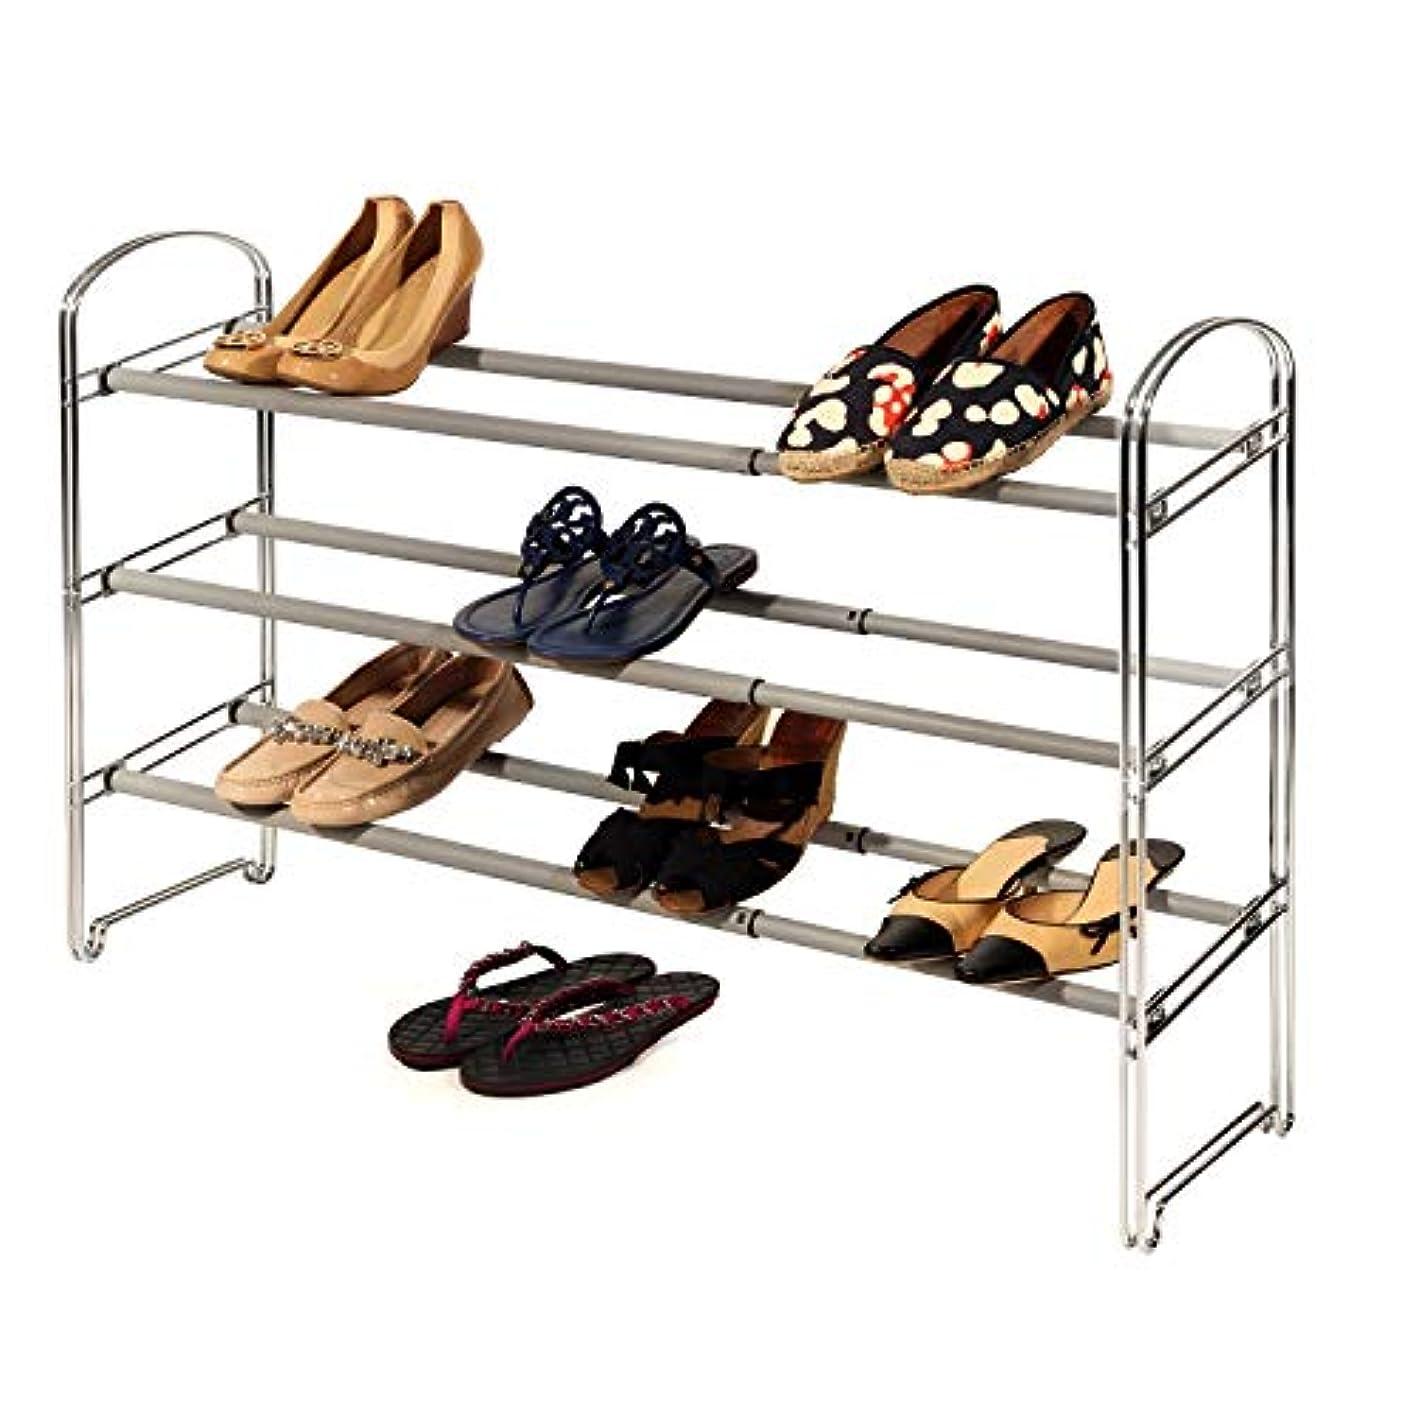 NCT 127 TSR Metal Chrome Shoe Organizer, Shoe Storage Organizing Unit, Entryway Shoe Storage Unit, Expandable Shoe Rack, 3 Tier Adjustable Rack with E-Book